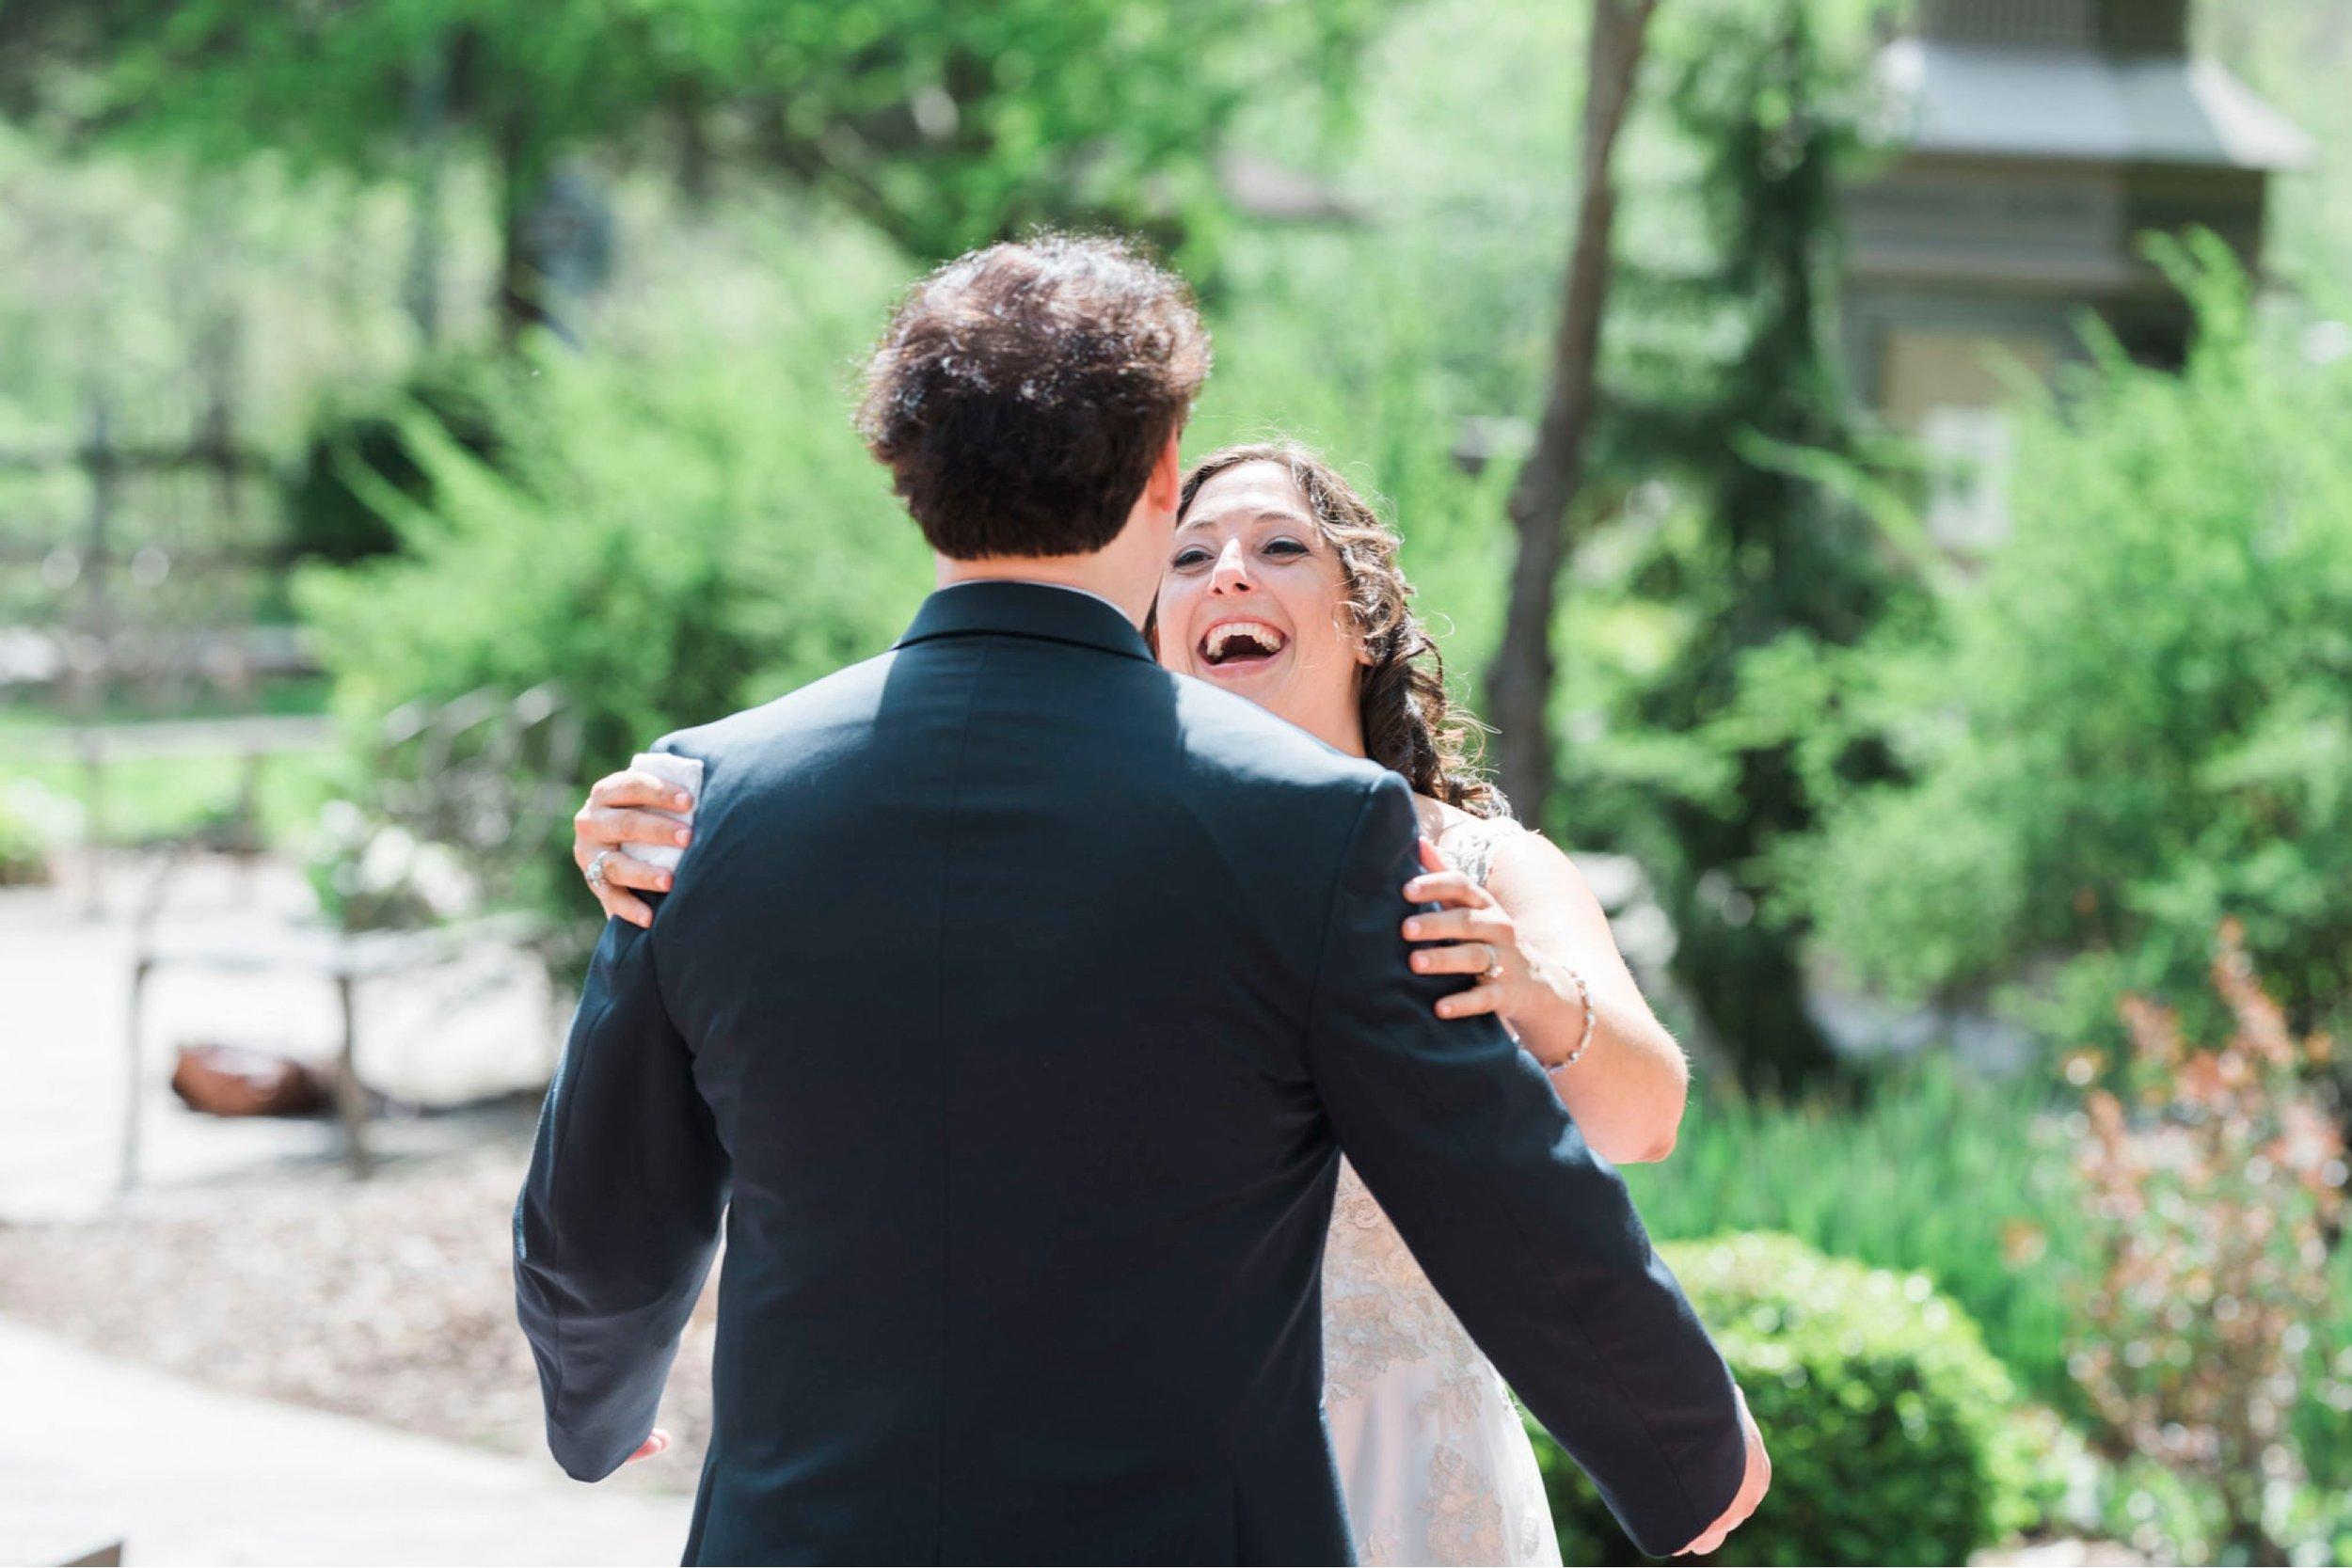 TheVirginianHotel_LynchburgVA_TheVirginianHotelWedding_Virginiaweddingphotographer_Lynchburgvawedding 18.jpg